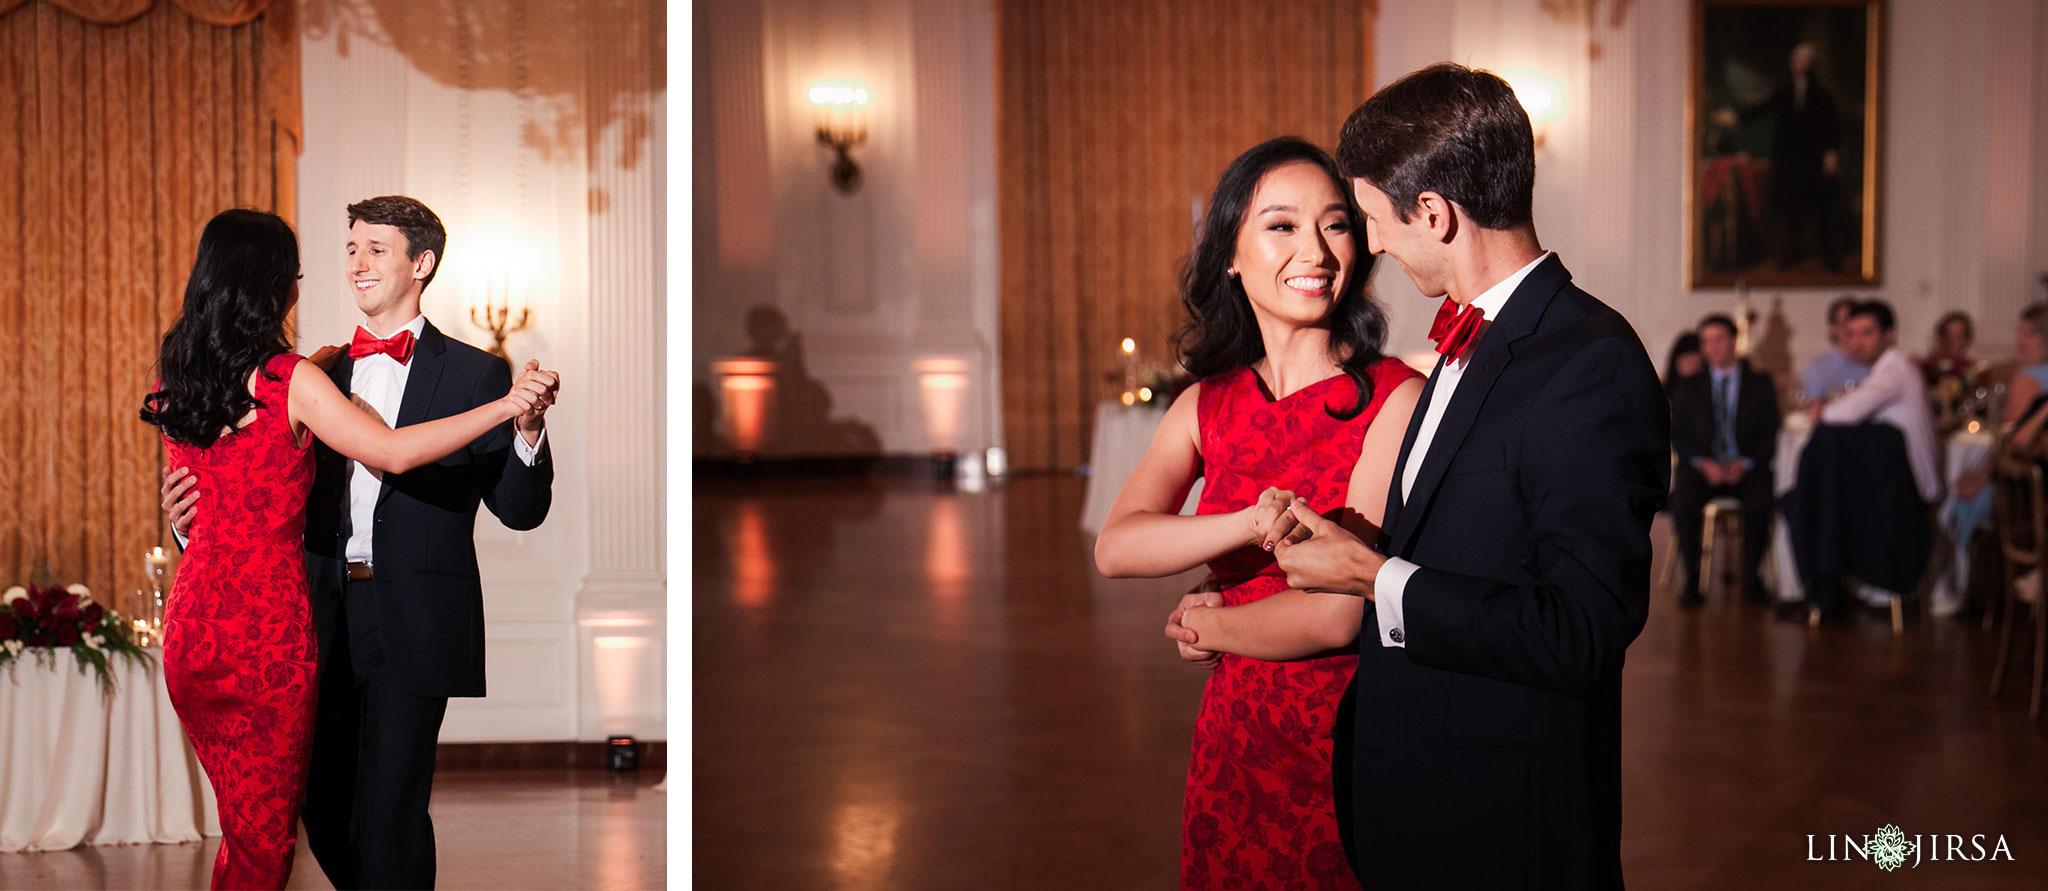 027 richard nixon library wedding reception photography 1